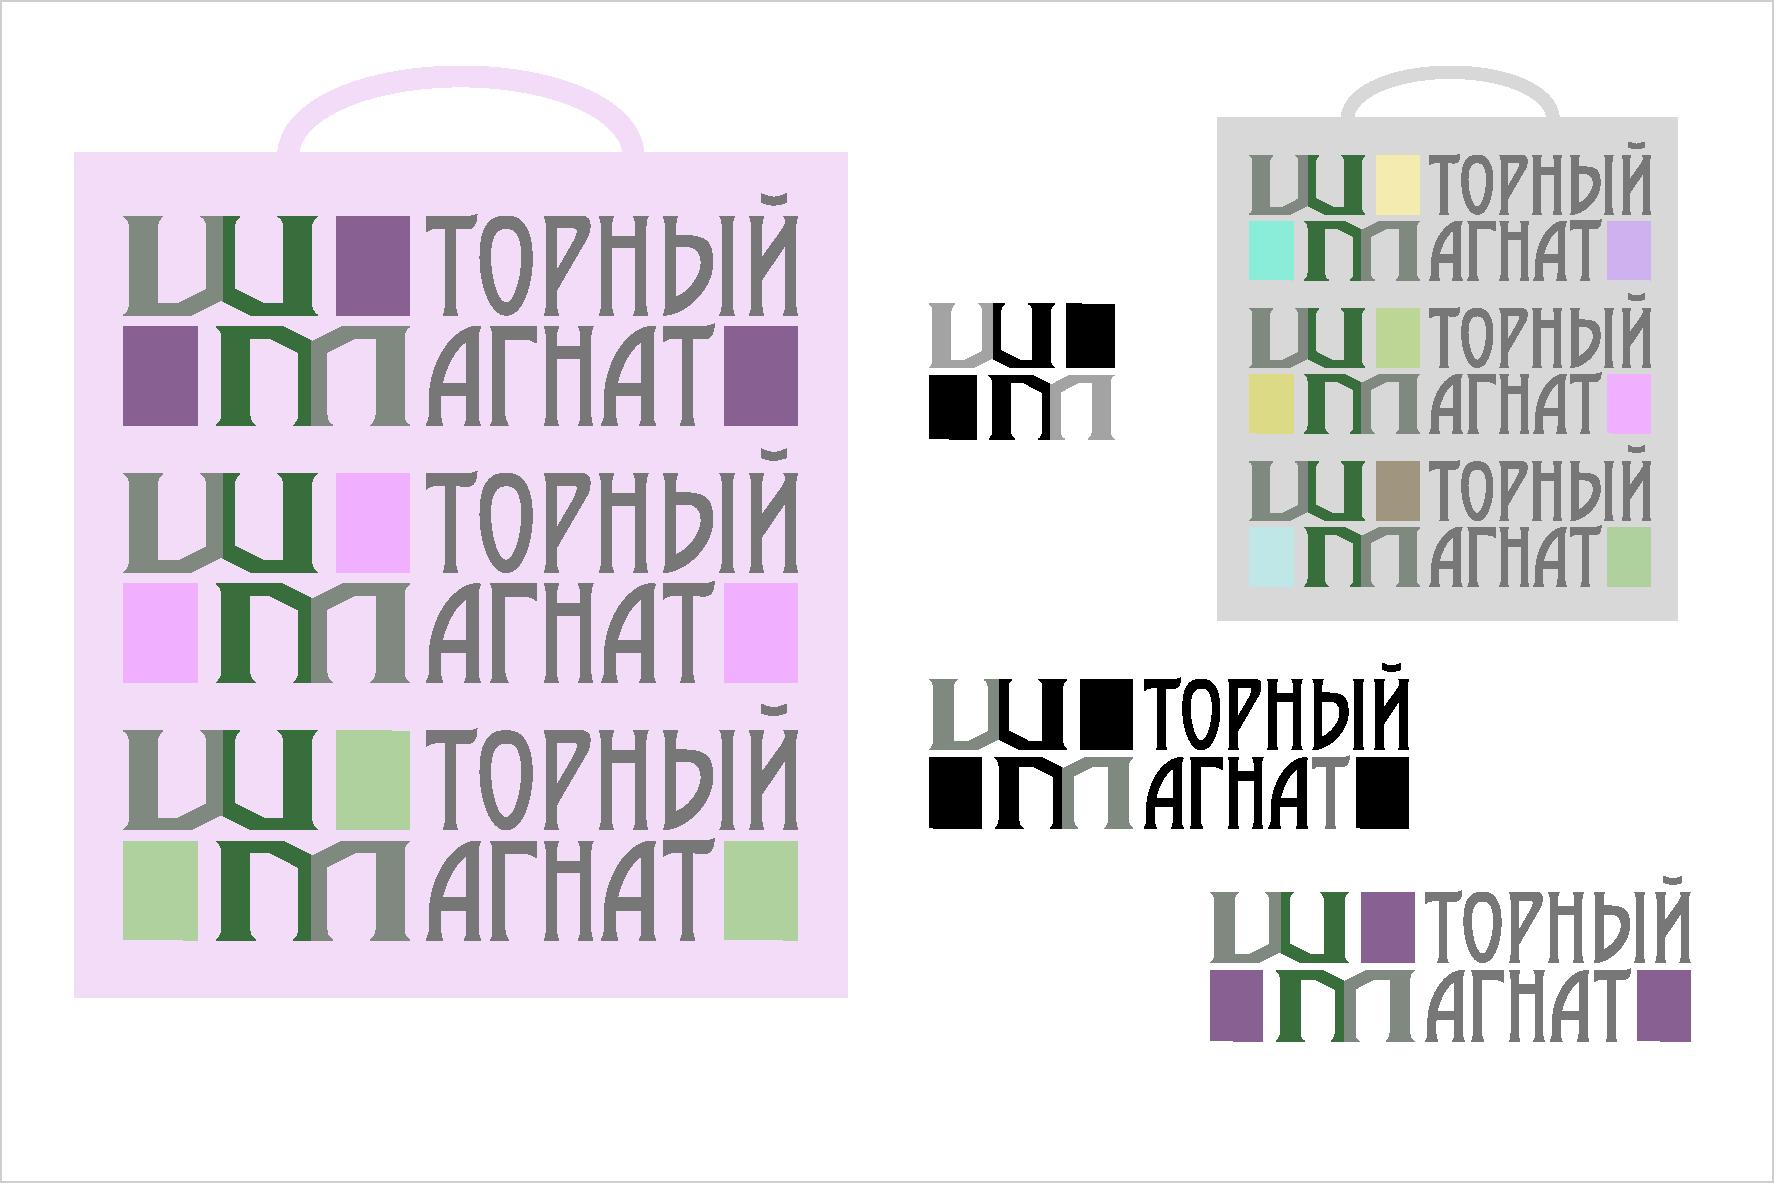 Логотип и фирменный стиль для магазина тканей. фото f_5005cdbb3b5d548a.png